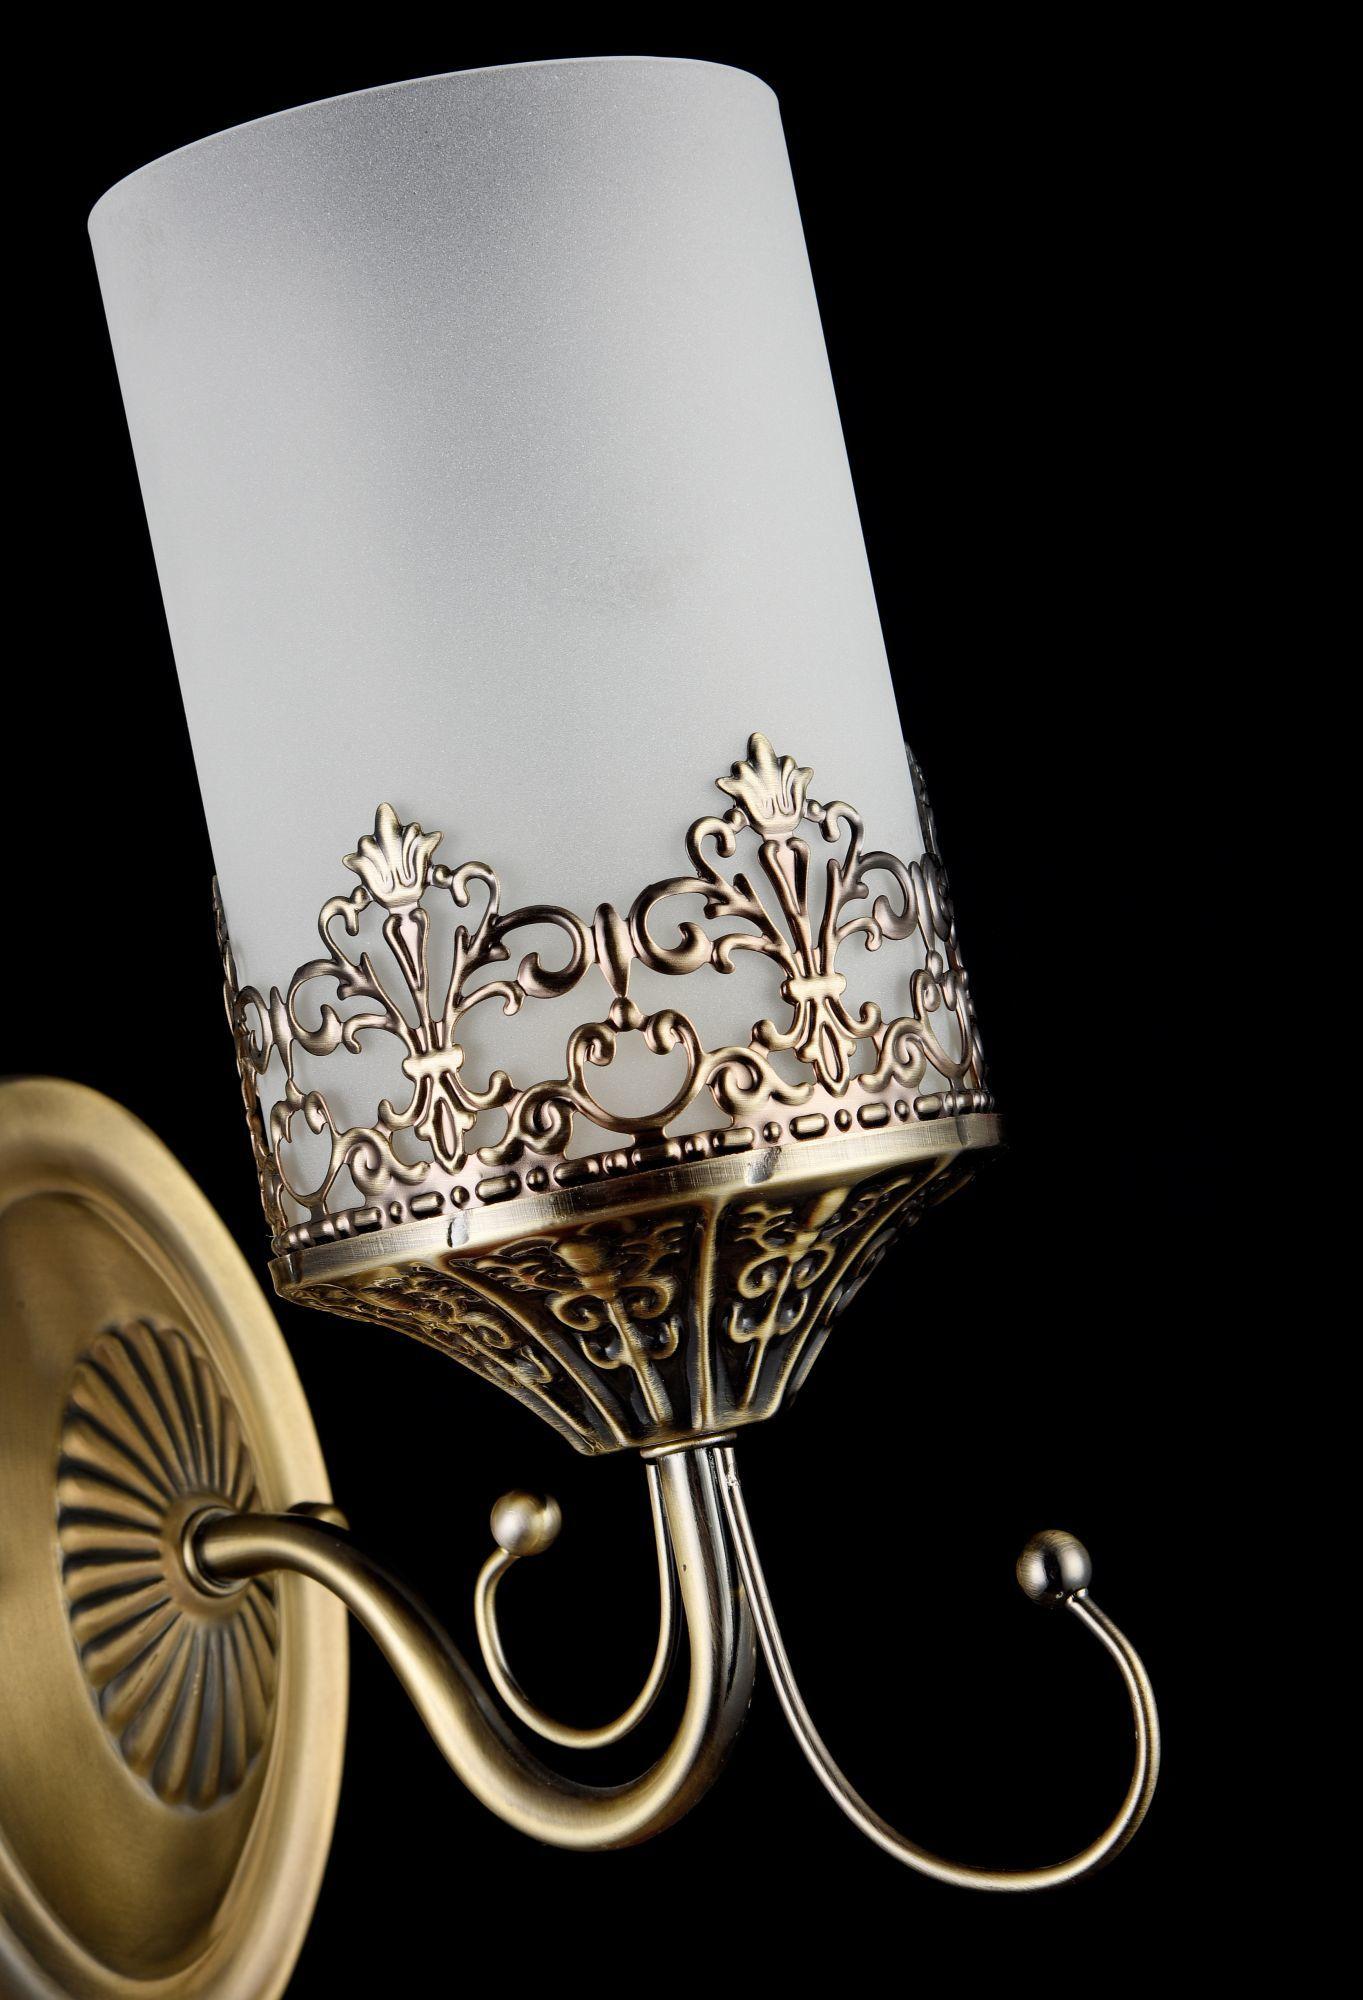 Бра Freya Sherborne FR2563-WL-01-BZ (arm563-01-r), 1xE14x60W, бронза, белый, металл, стекло - фото 4